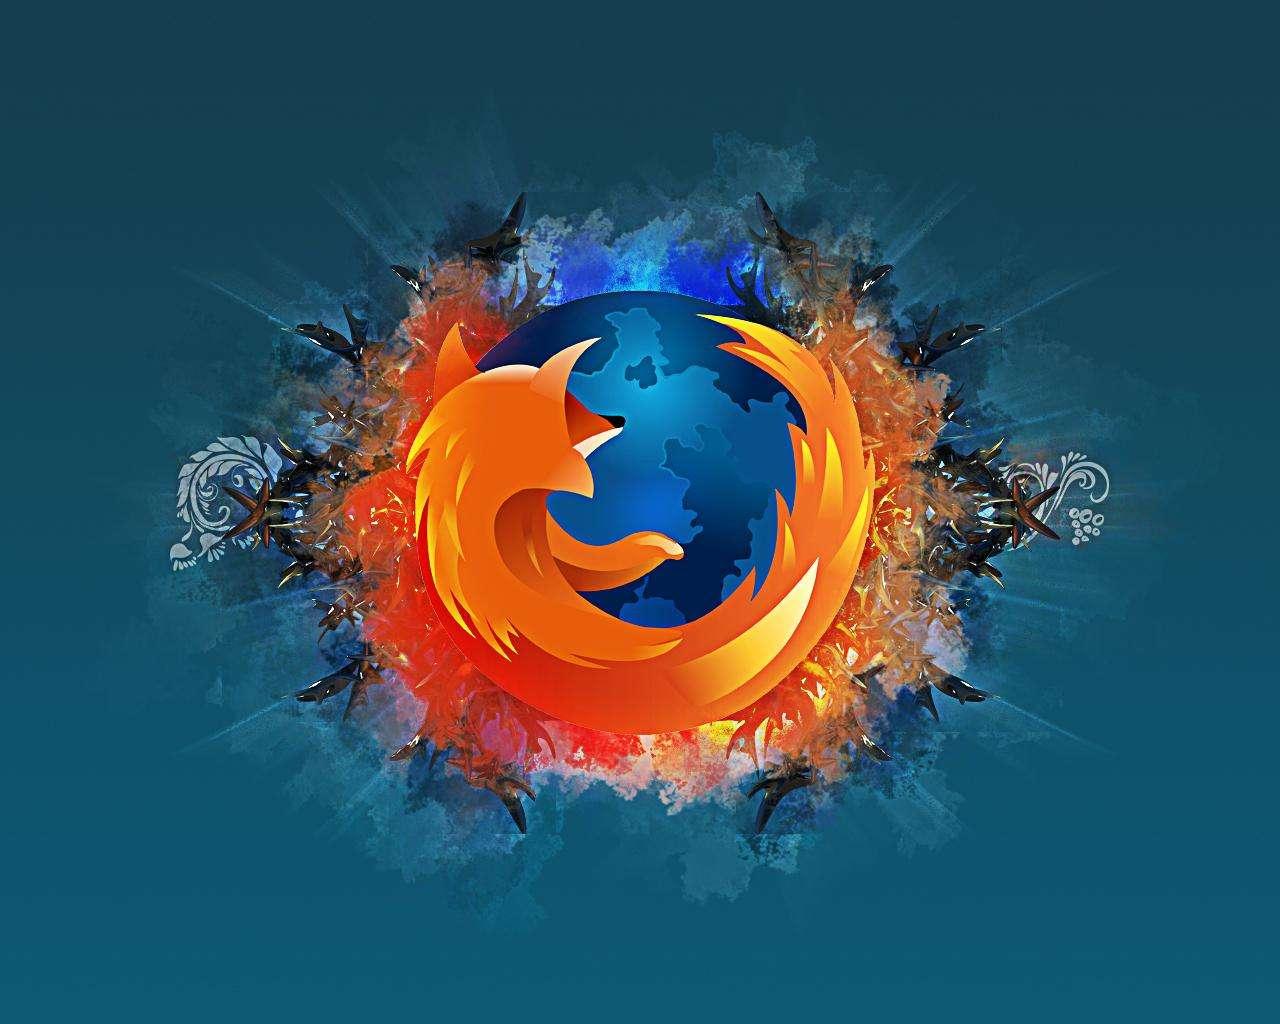 Firefox浏览器更新内容:将计划隐藏HTTPS和WWW[多图]